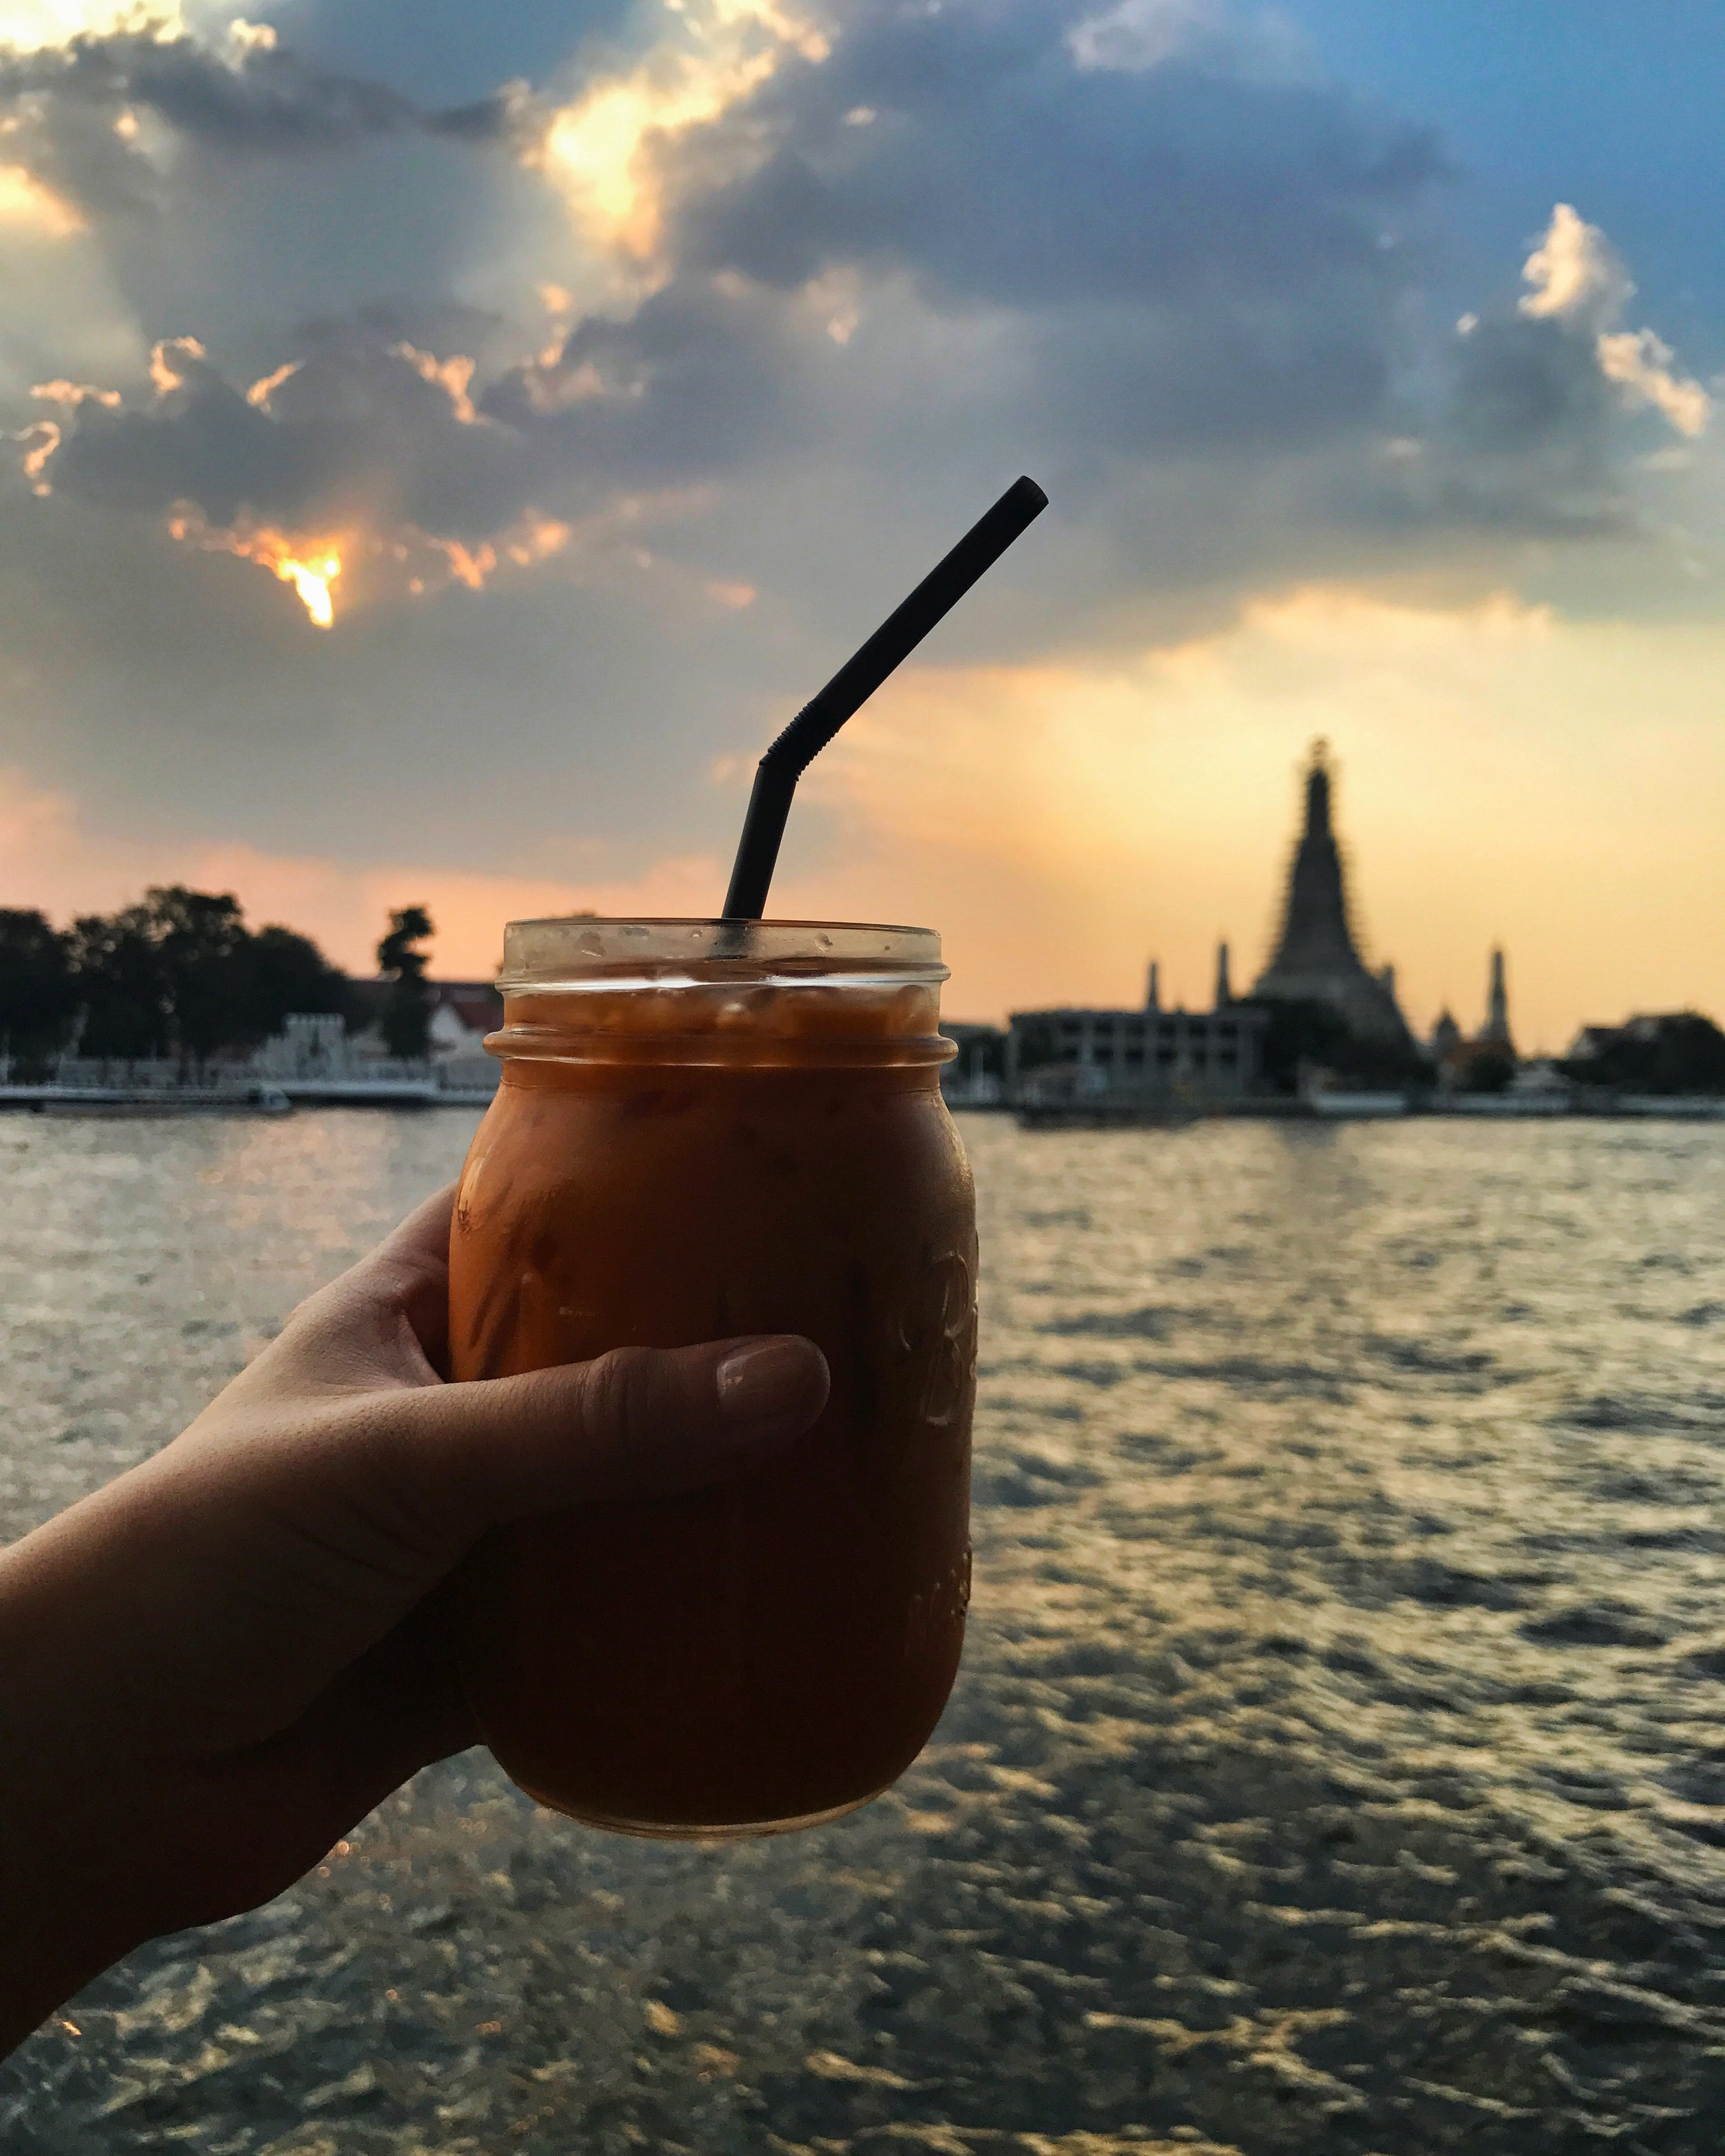 ViVi The Coffee Place @Chaophraya River (Banglamphu)